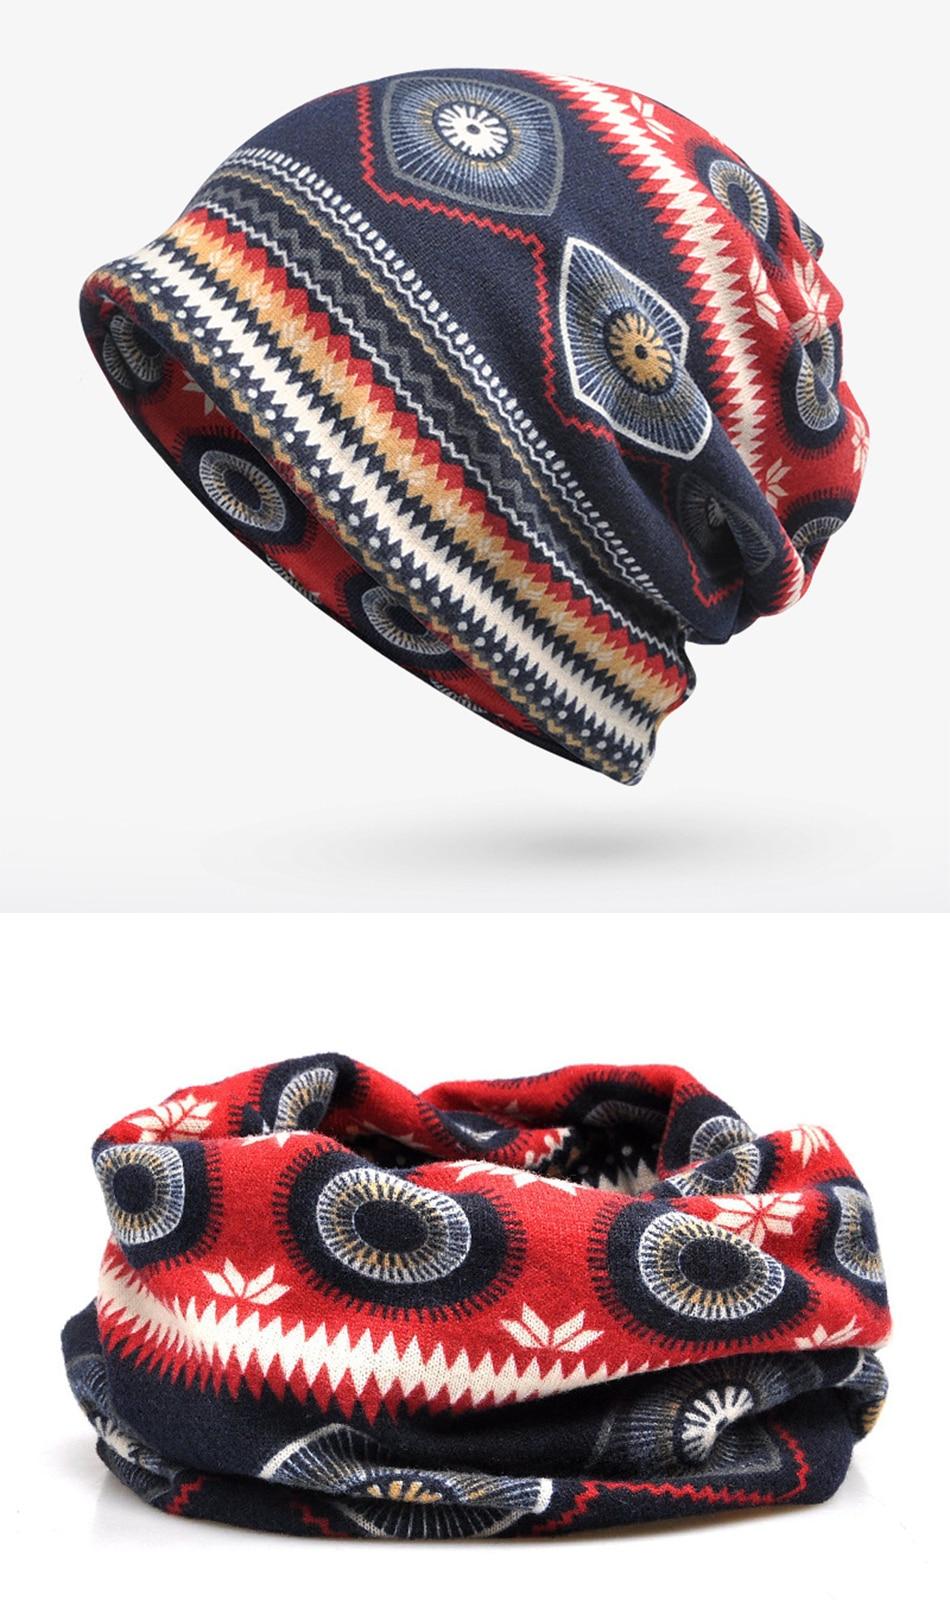 FS Winter Soft Warm Skullies Beanies Hip Hop Hat Men Elastic Hats Green Red Trendy Streetwear Scarf Bonnet For Women Cycling Cap